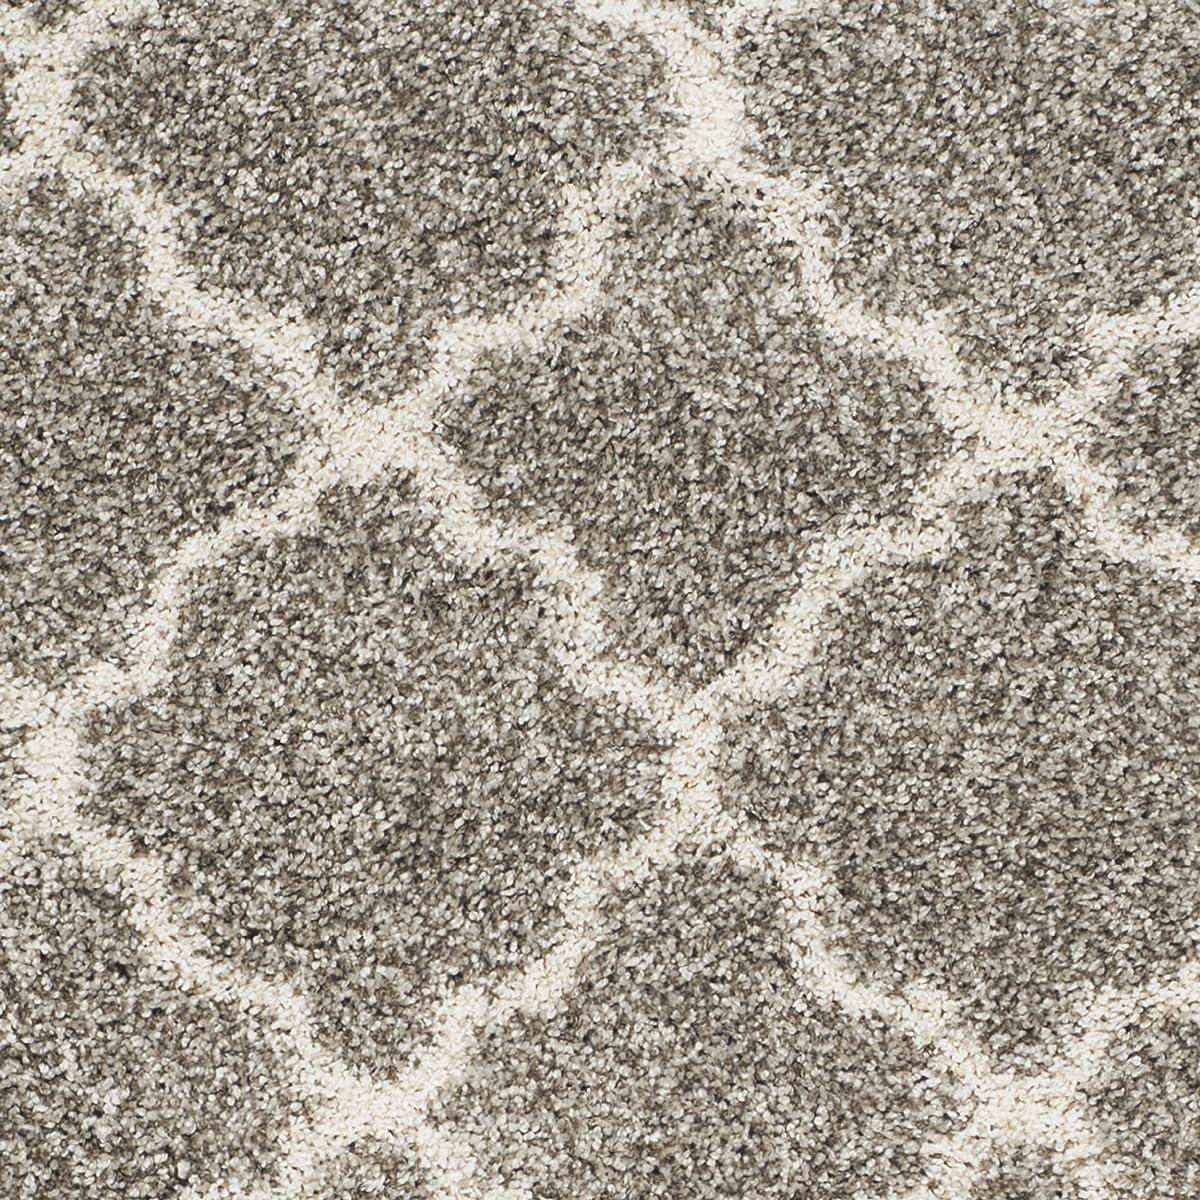 Safavieh Hudson Shag Collection SGH282B Grey and Ivory Moroccan Geometric Quatrefoil Area Rug (4 x 6)